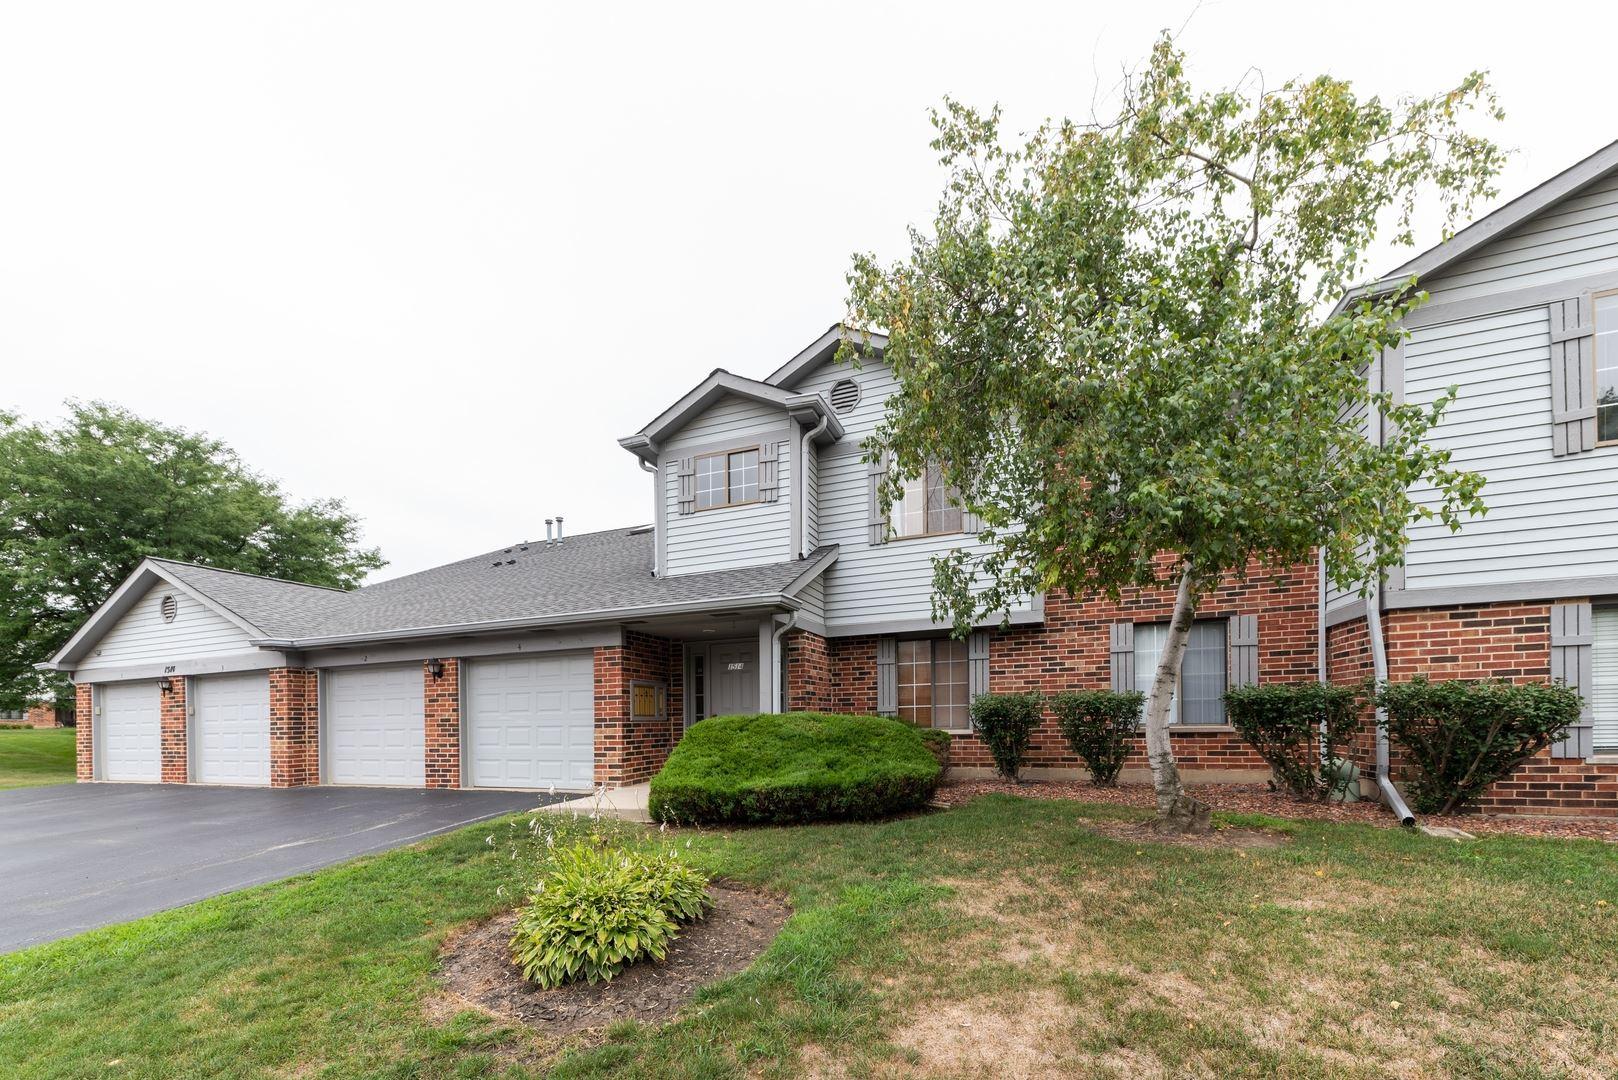 1514 W Partridge Lane #1, Arlington Heights, IL 60004 - #: 10806762